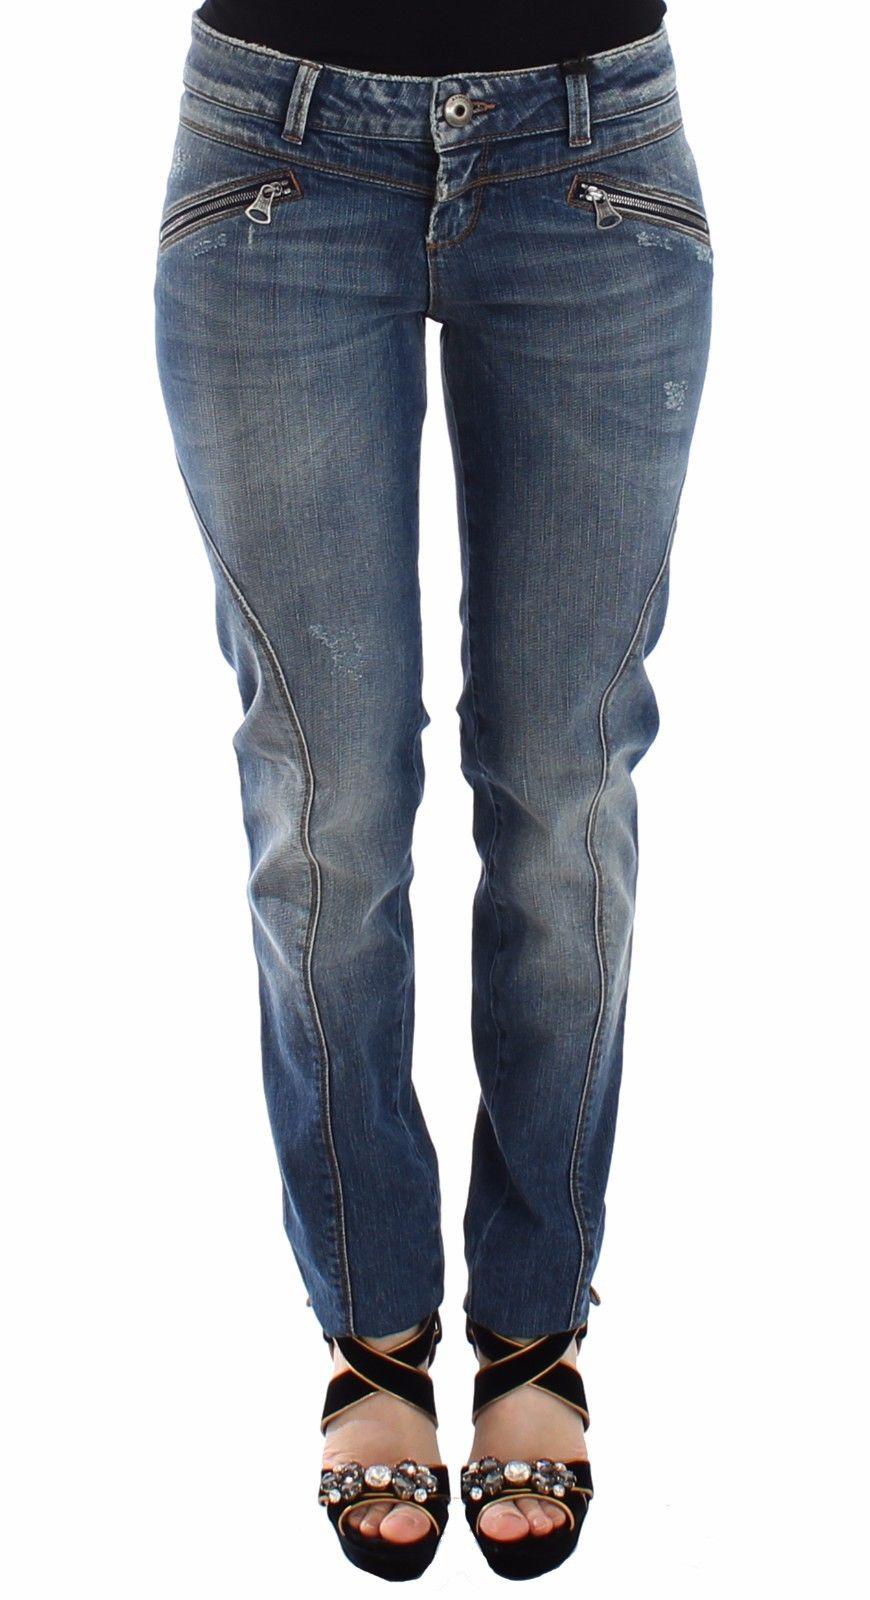 Ermanno Scervino Women's Slim Jeans Blue SIG12687 - IT40